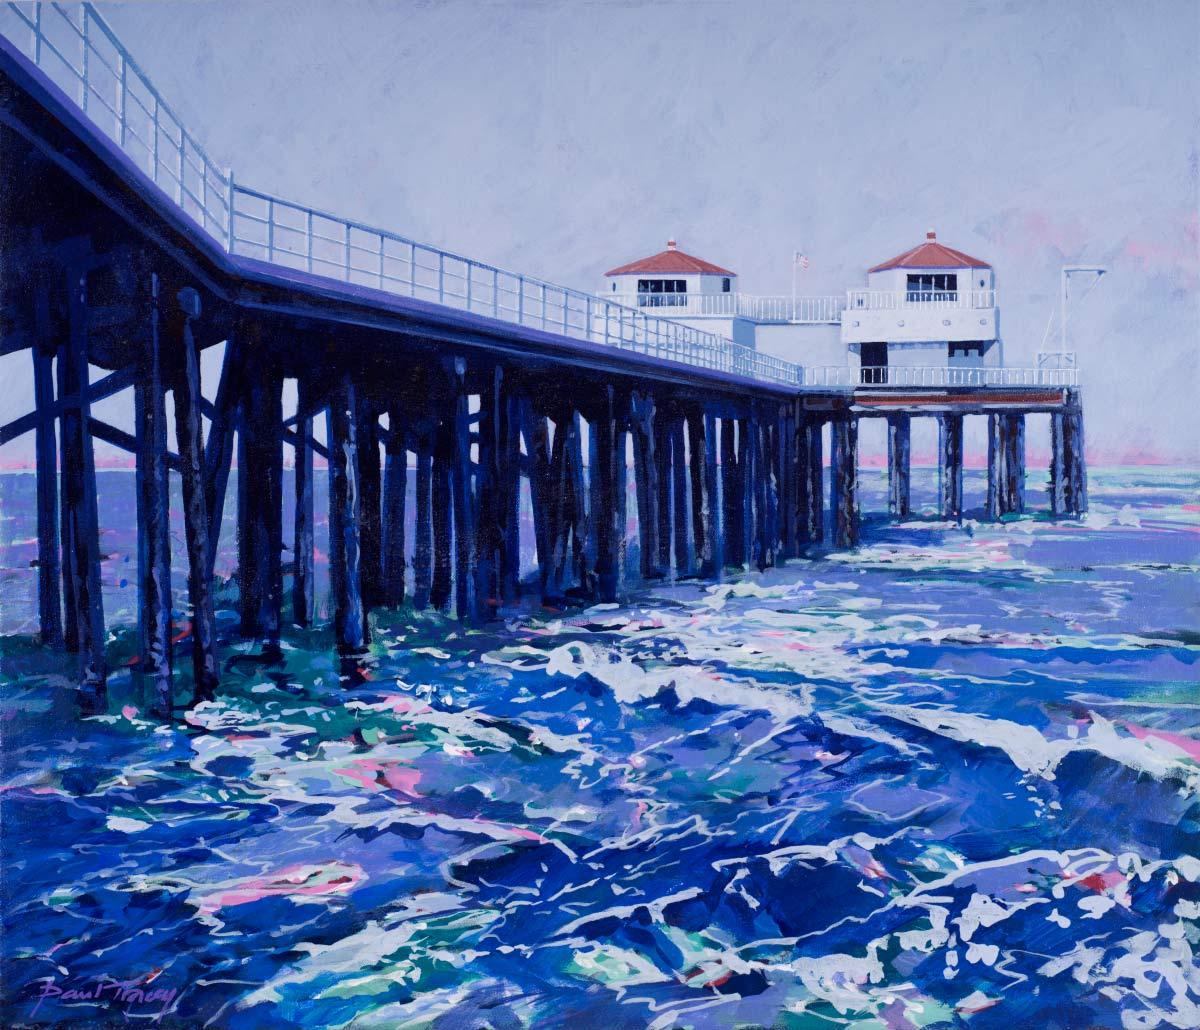 Painting of Malibu Pier